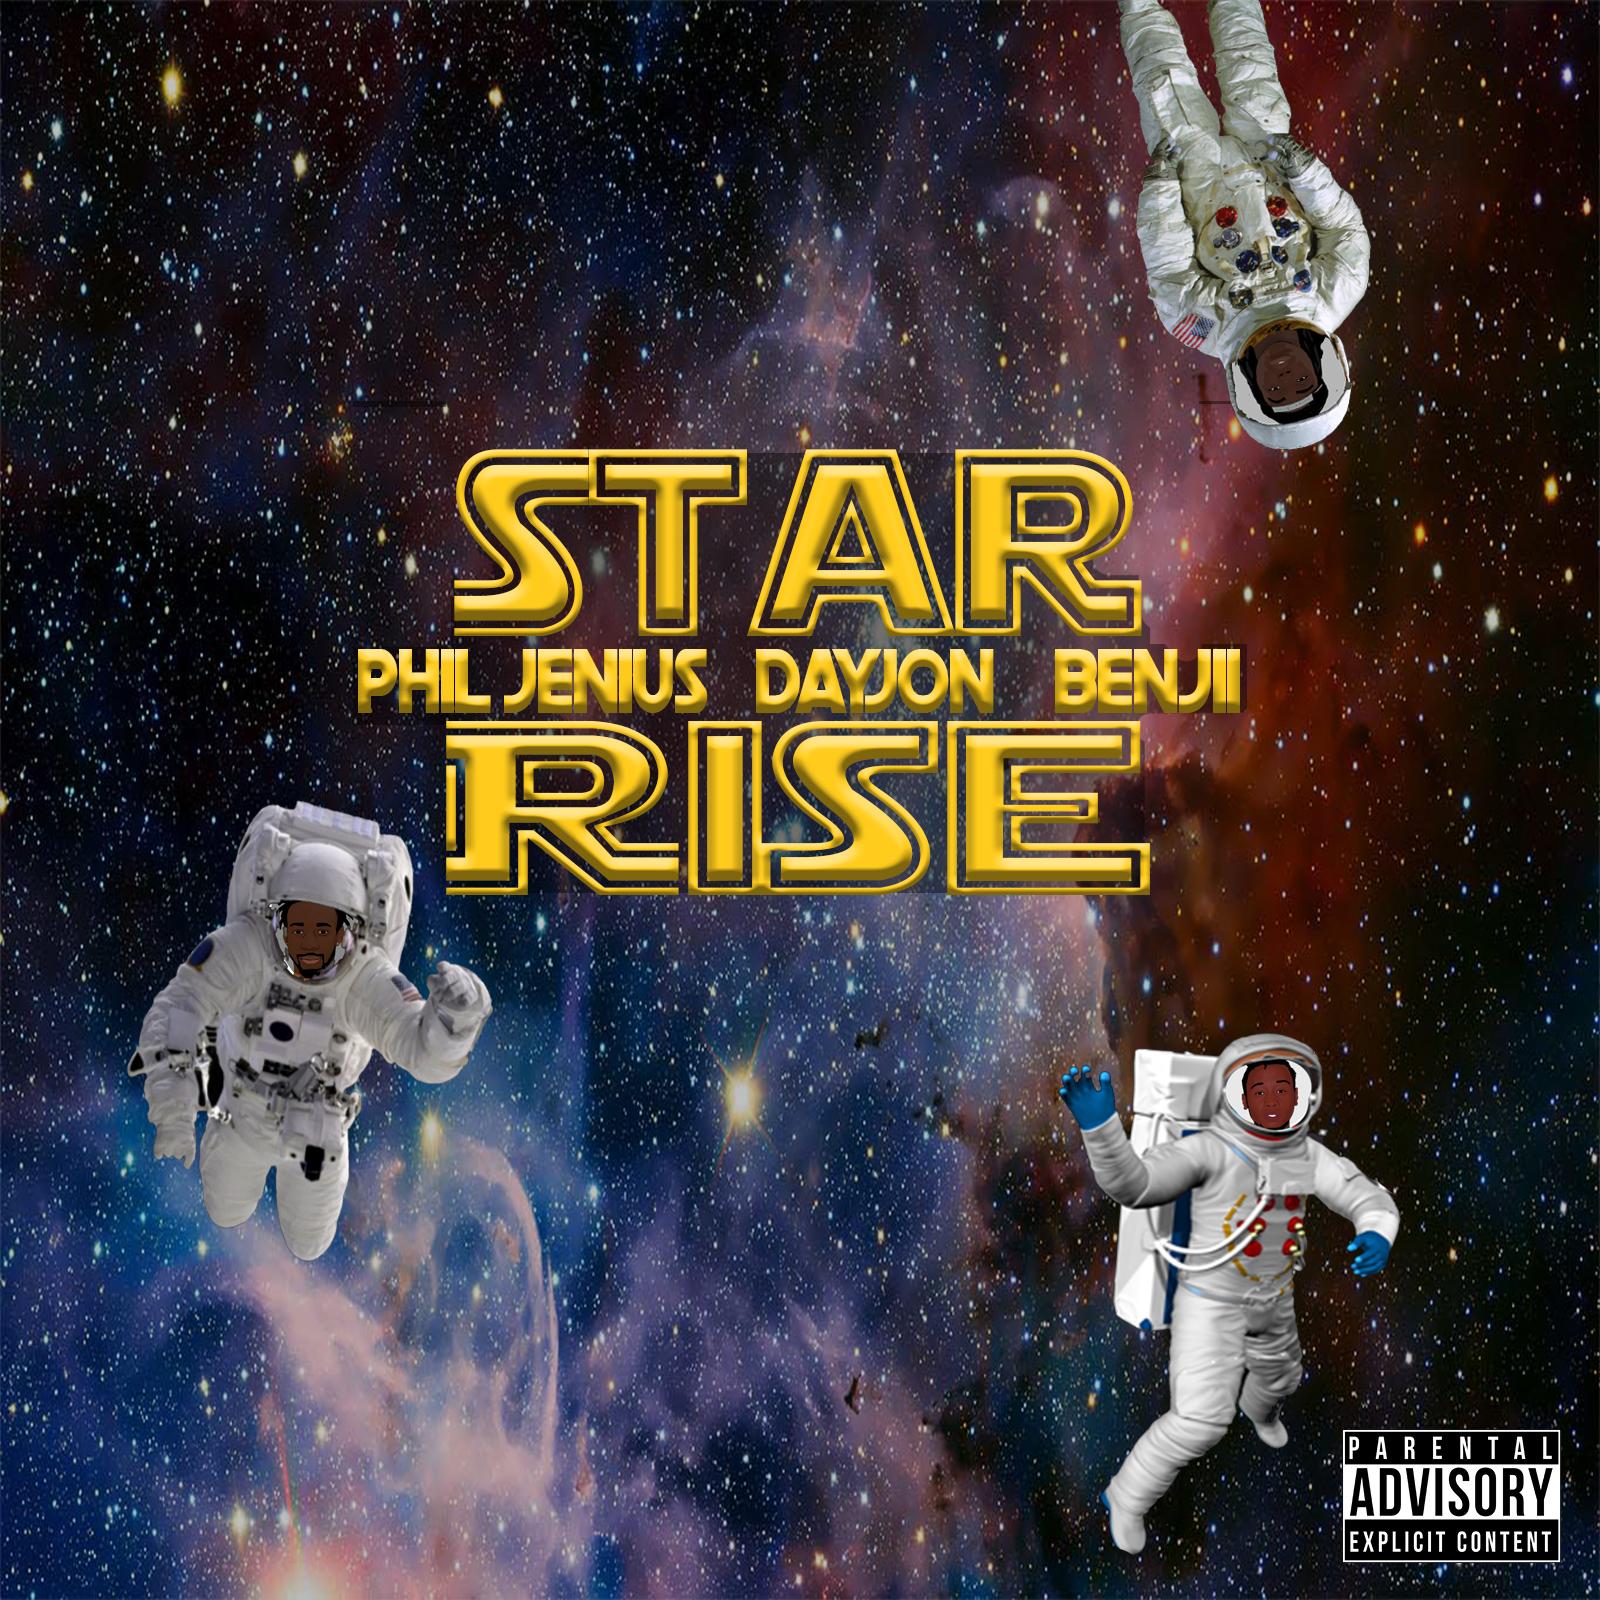 star rise co.jpg